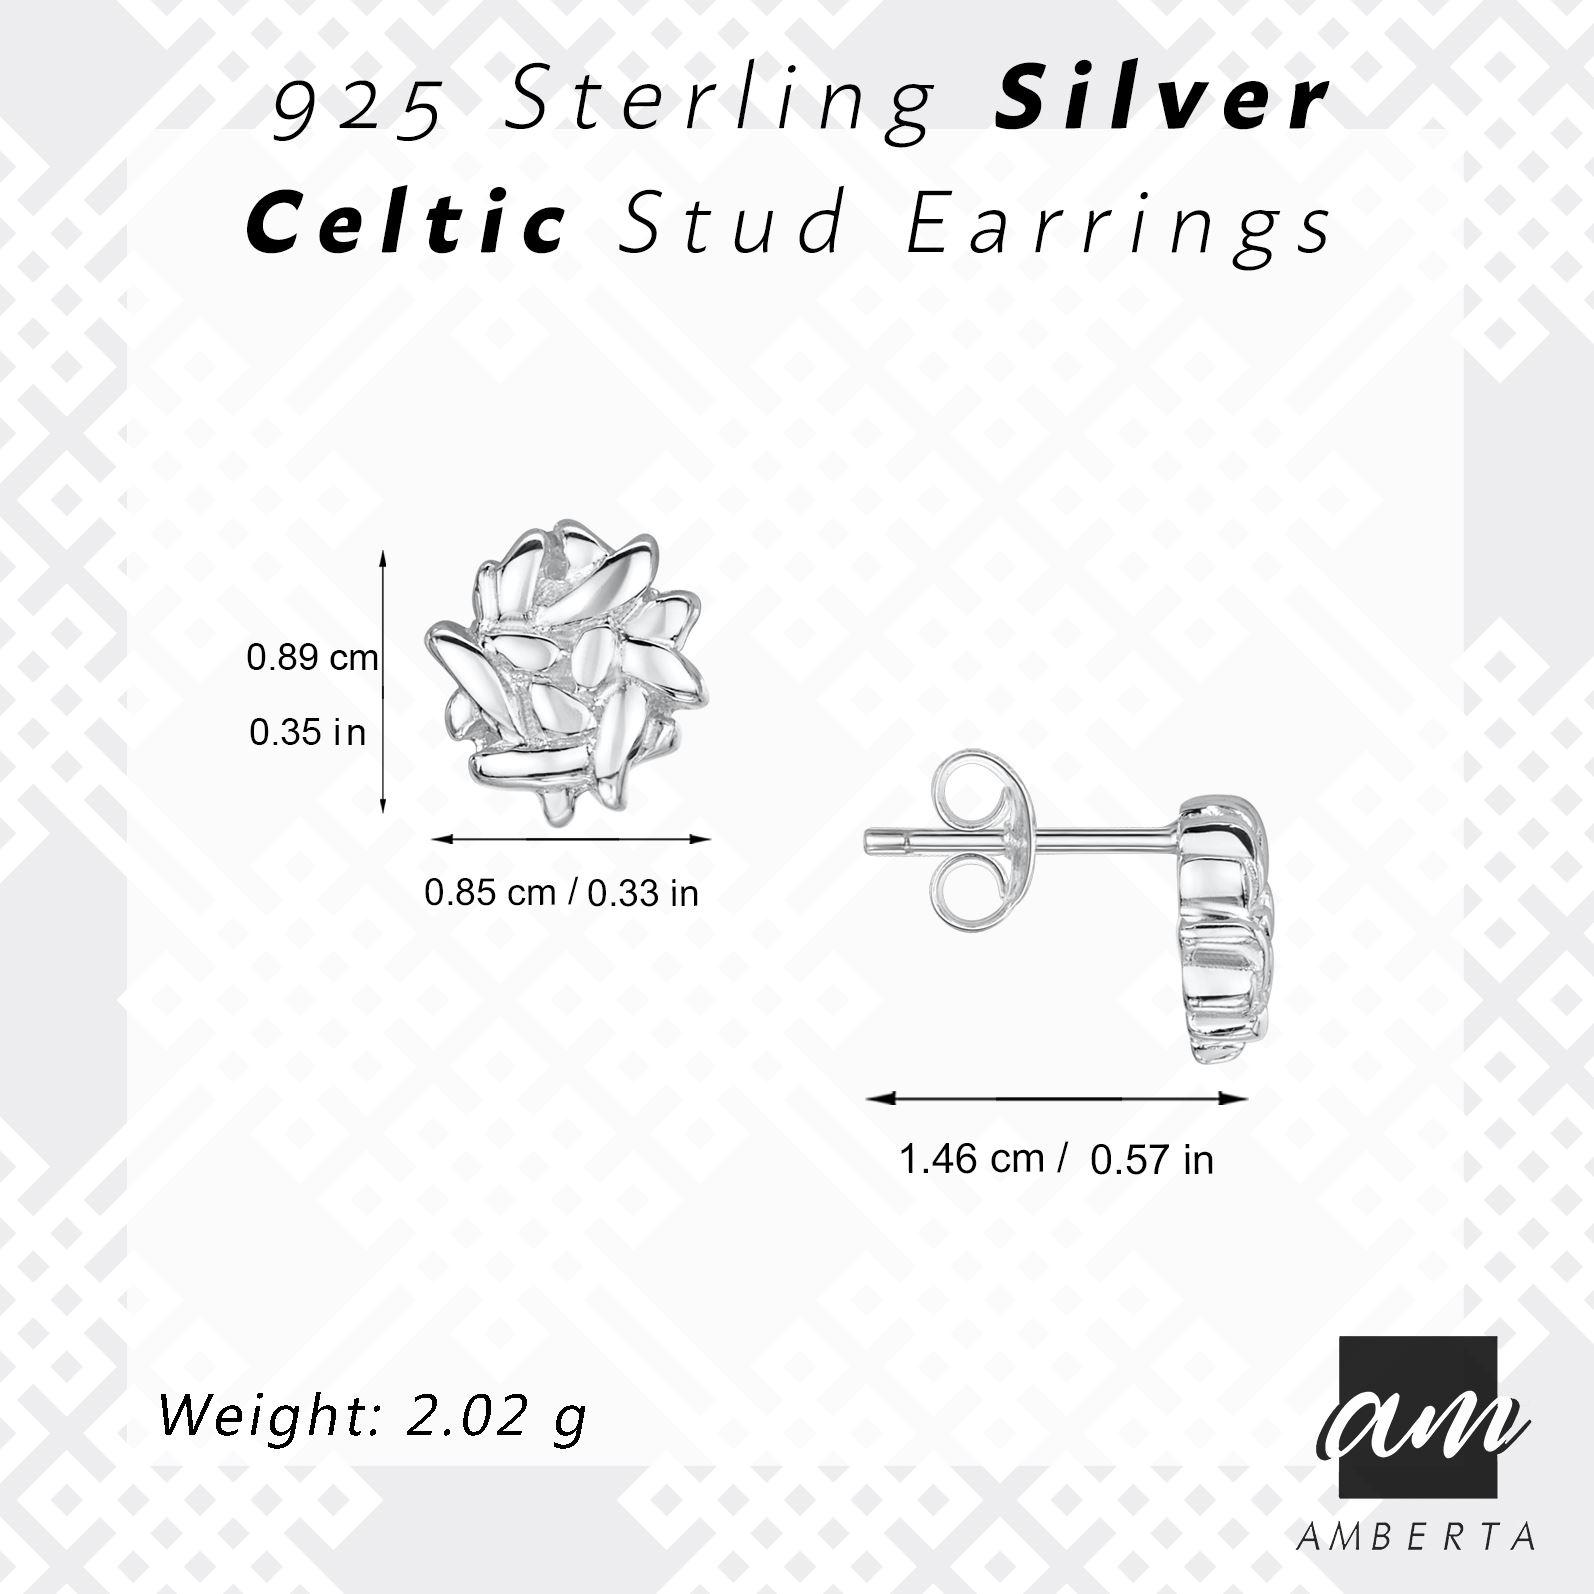 Amberta-925-Sterling-Silver-Celtic-Knot-Earrings-for-Women-Irish-Design miniature 9